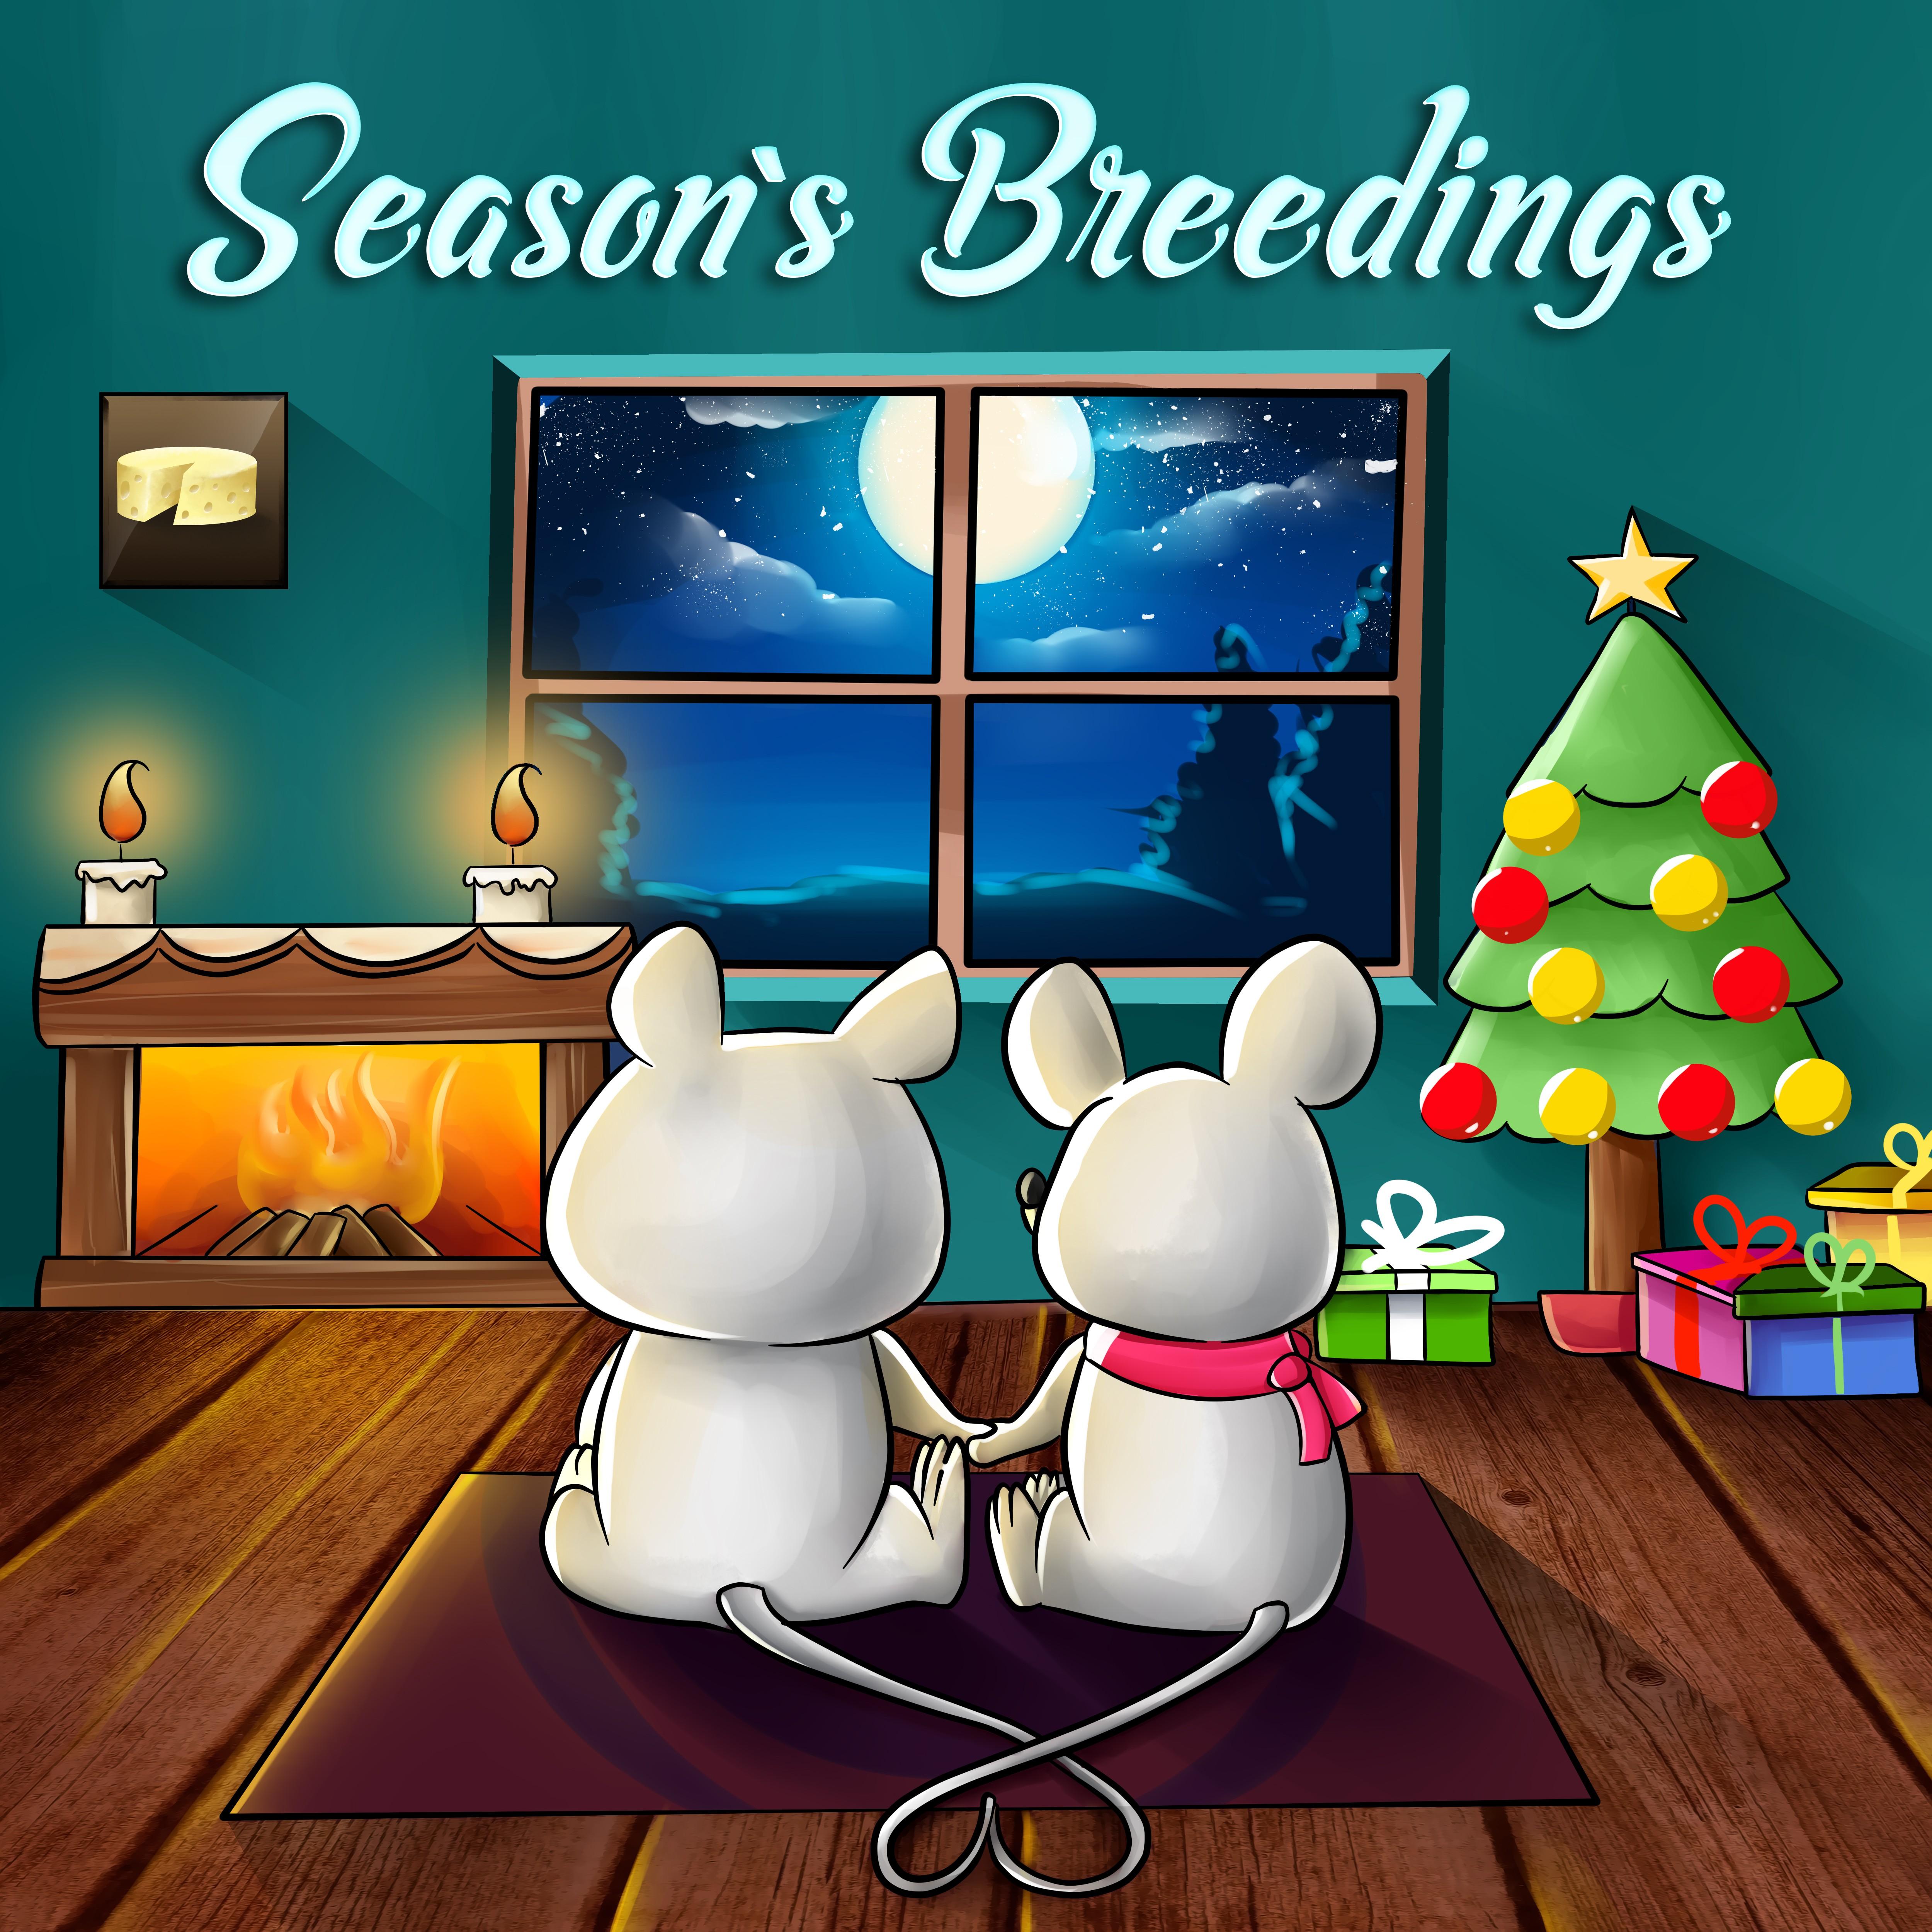 Create Playful Holiday Card - SEASONS BREEDINGS with Mice